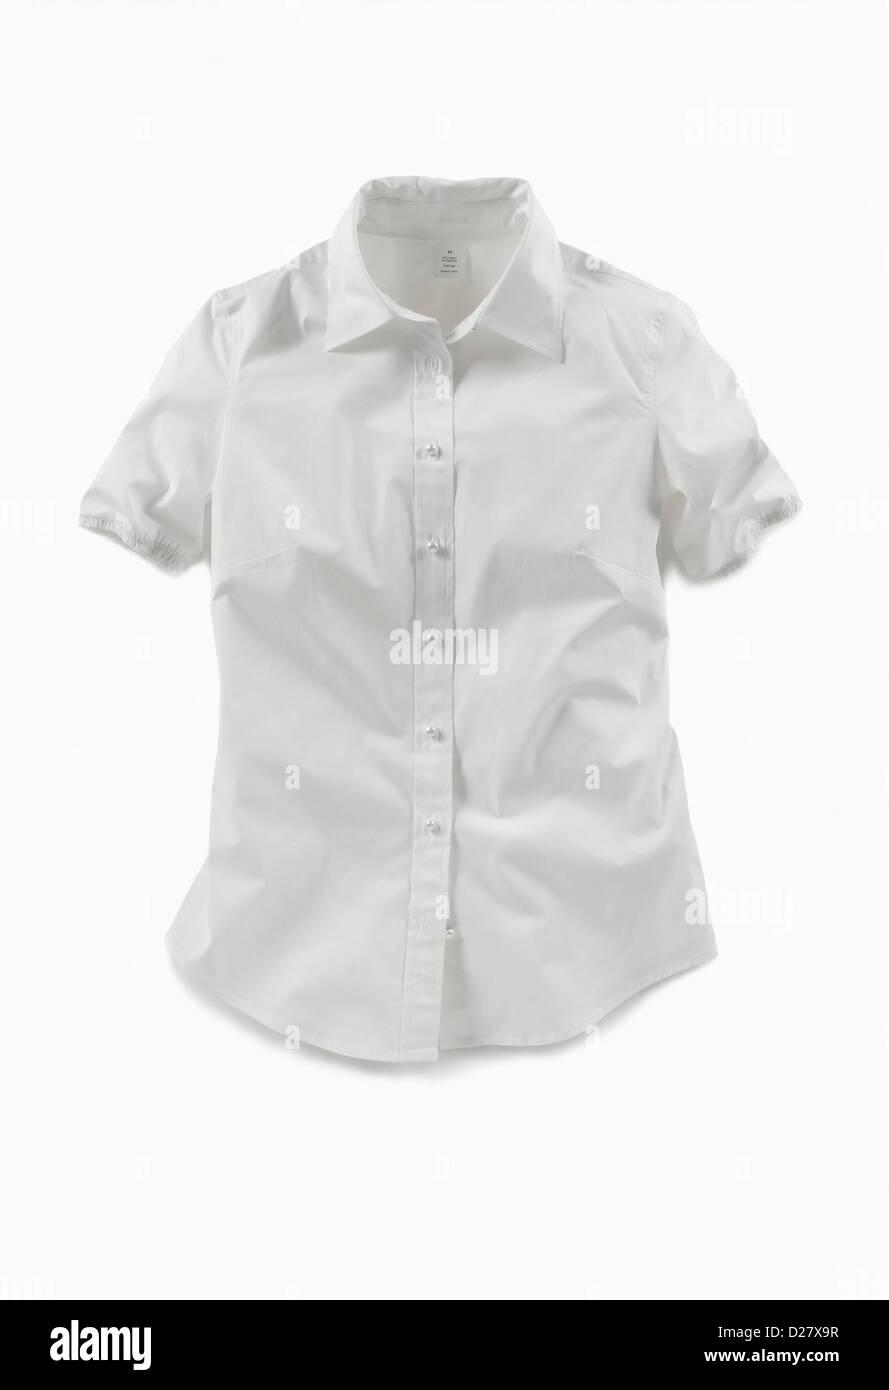 Short-Sleeved White Blouse on White Background - Stock Image